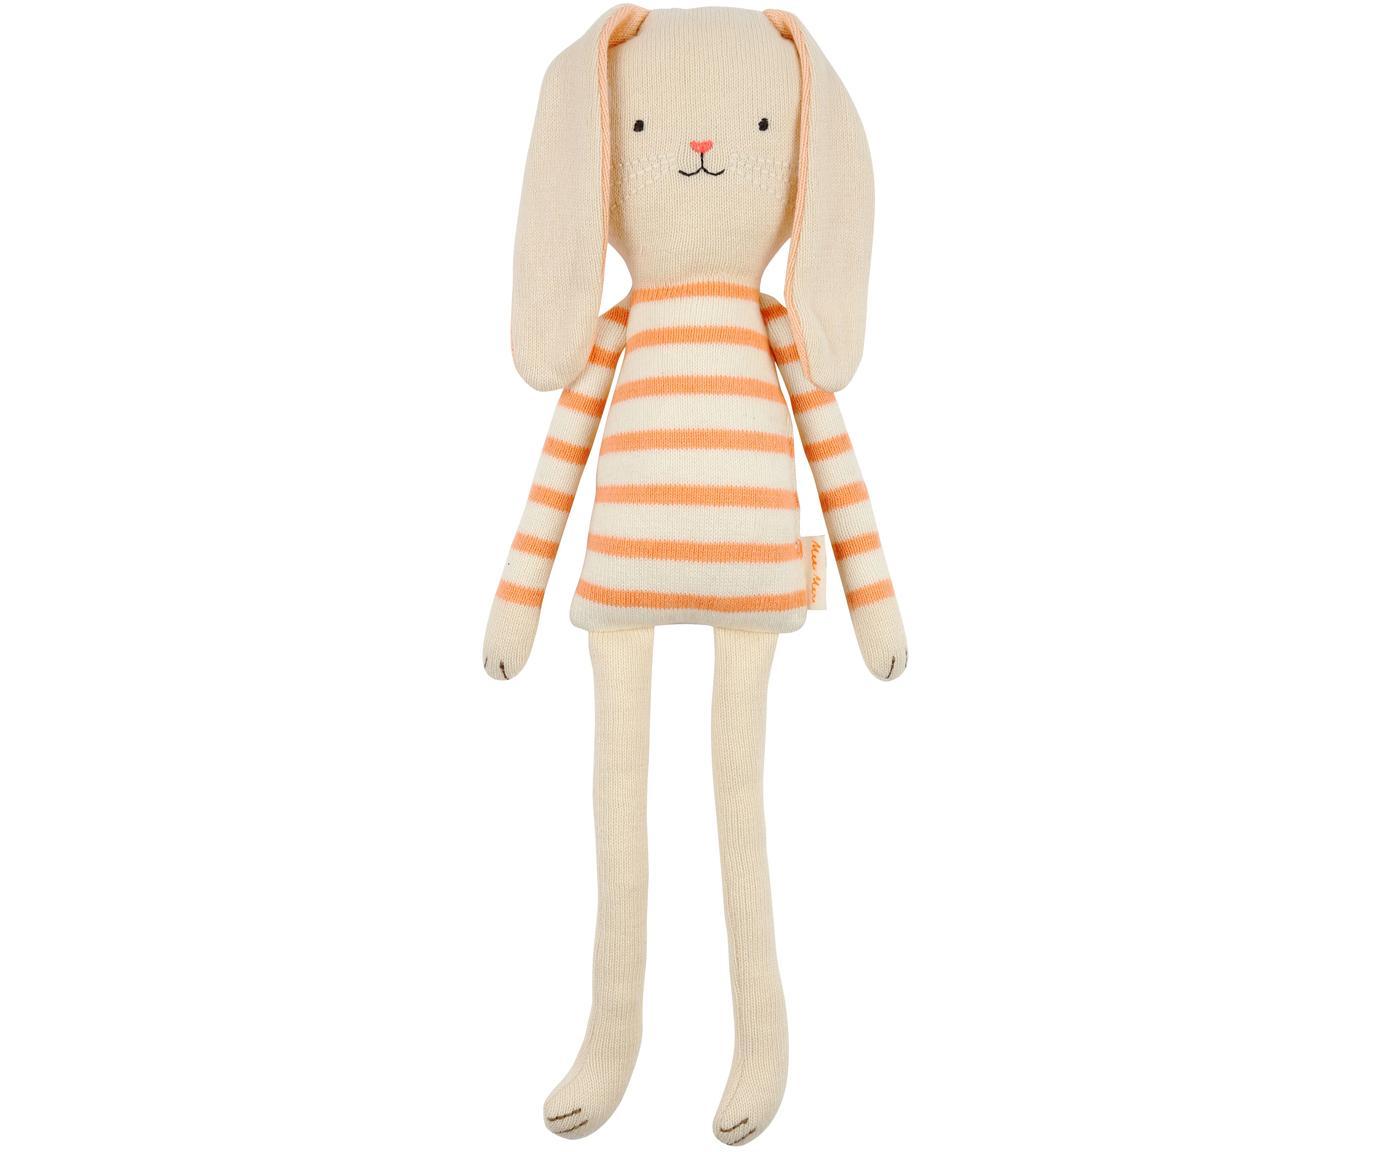 Peluche de algodón ecológico Bunny, Algodón orgánico, Beige claro, naranja, An 12 x Al 33 cm